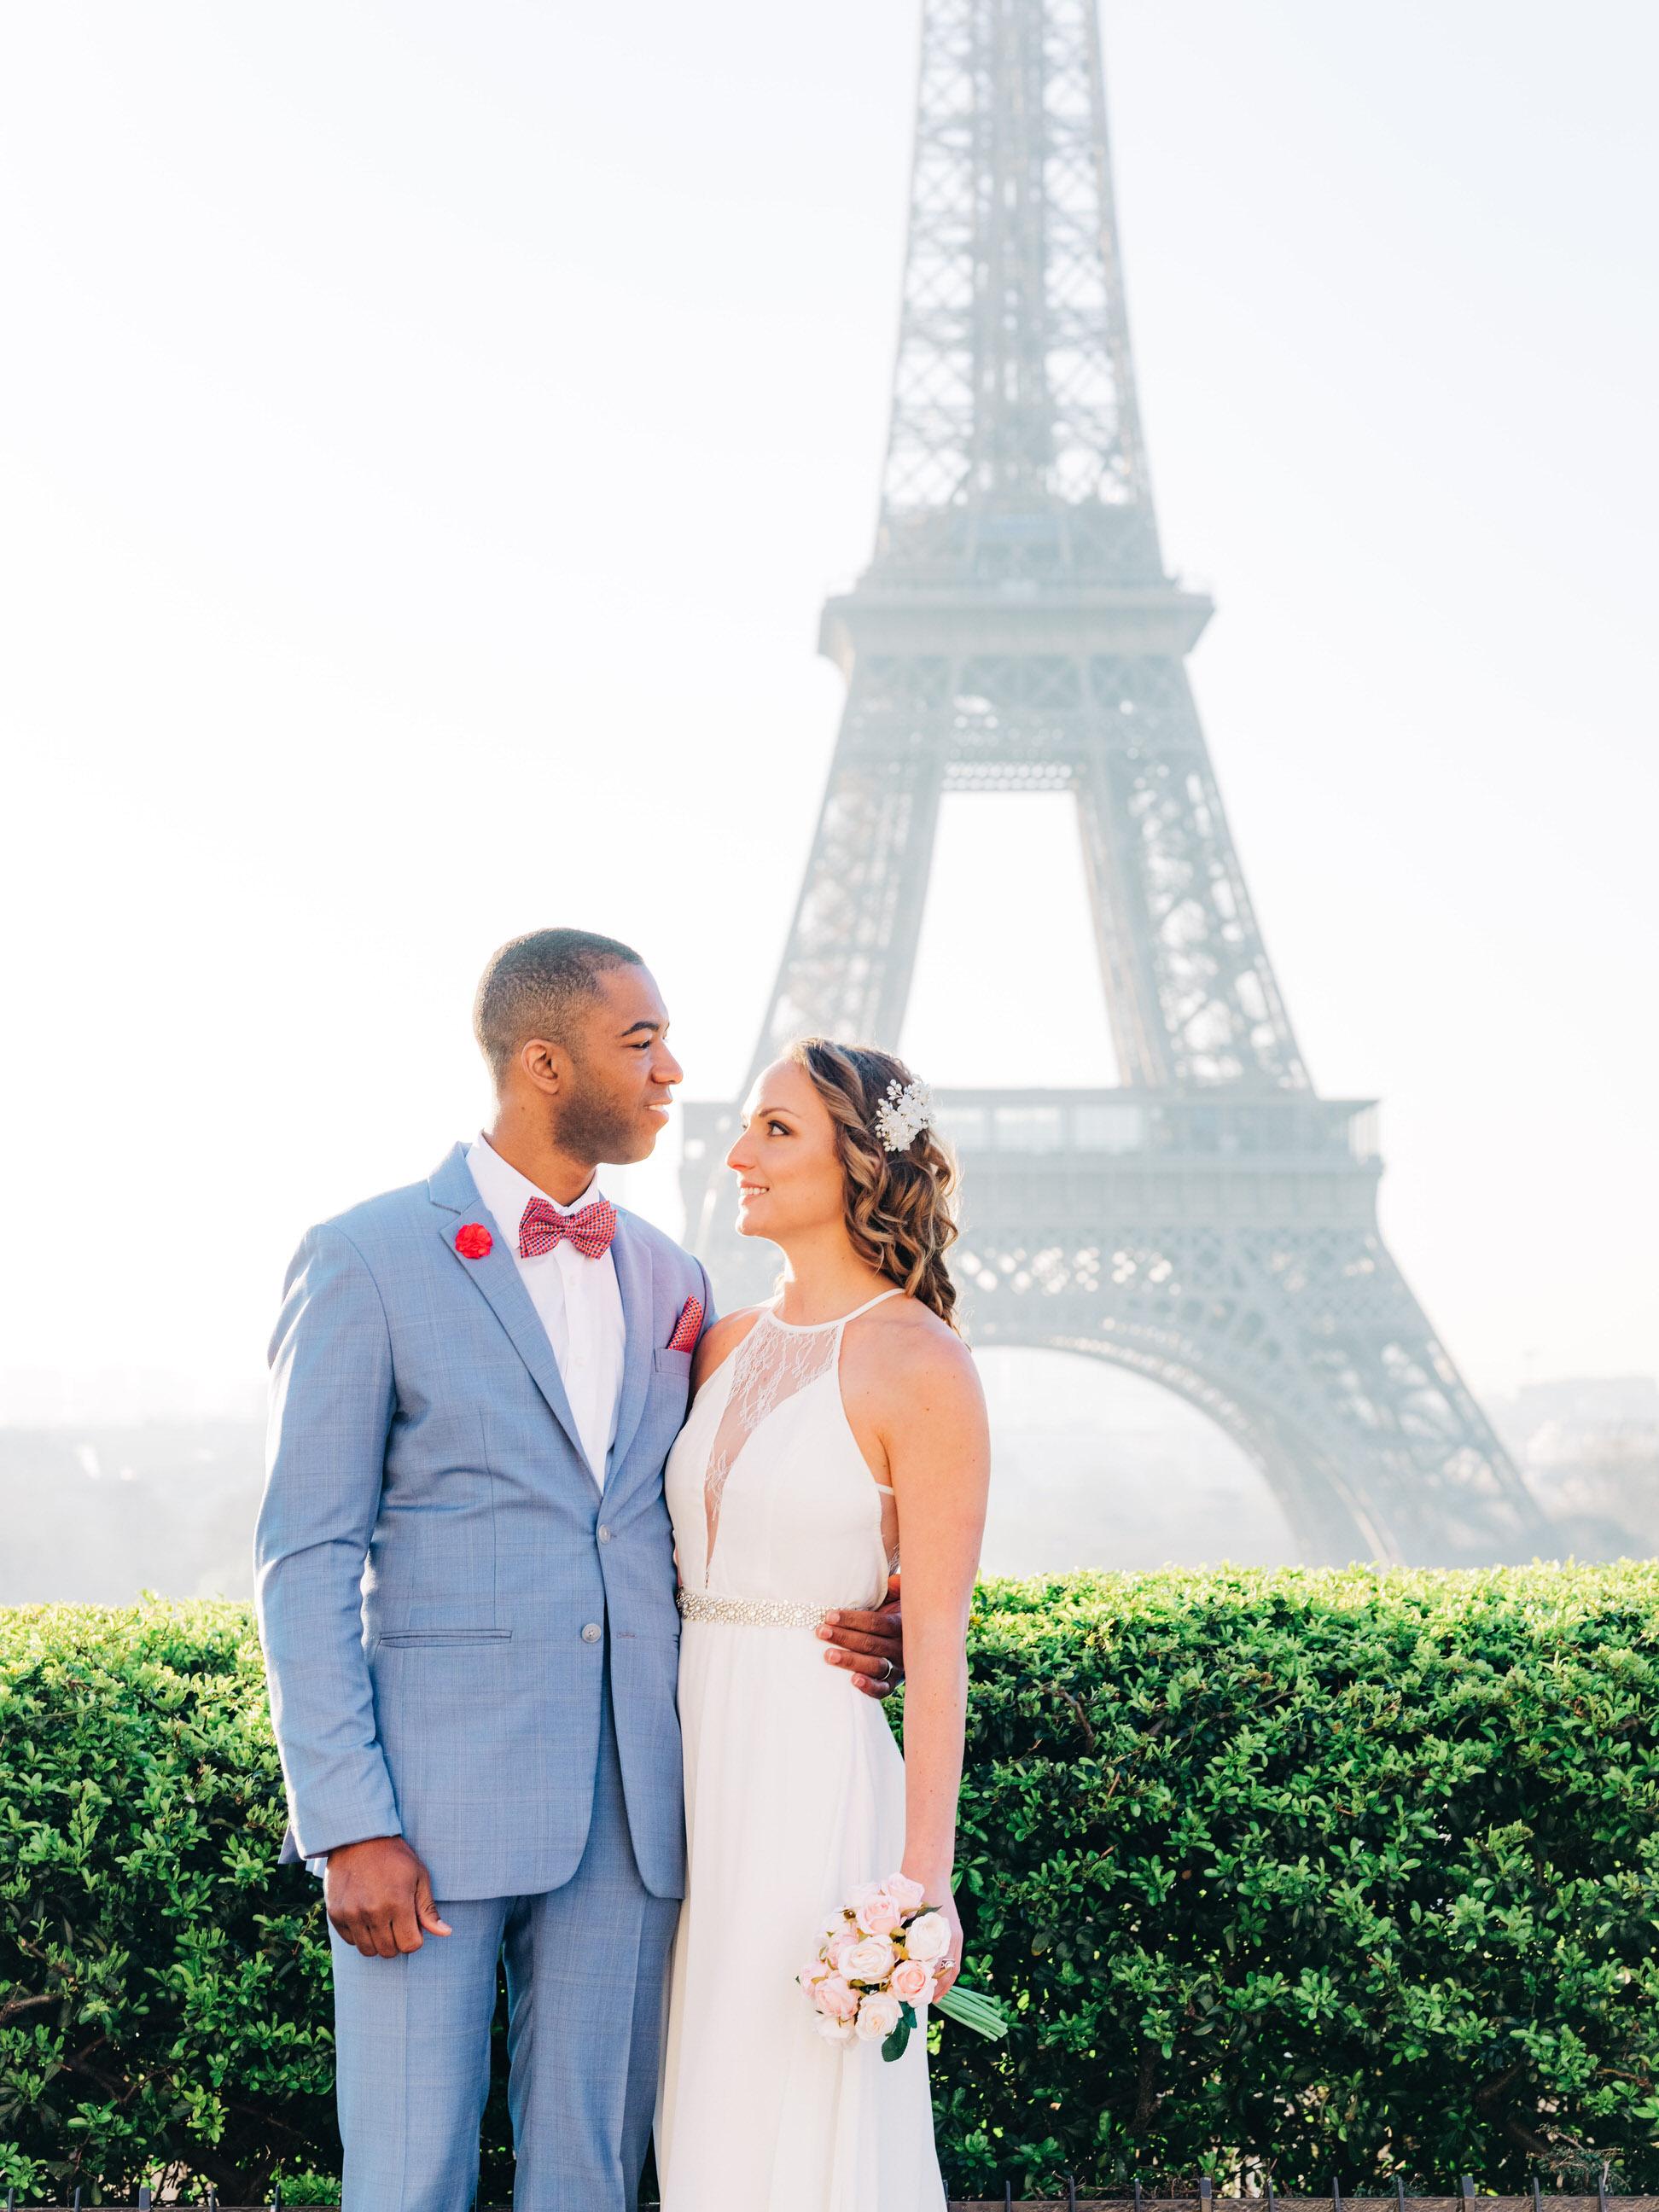 Honeymooners under the spring Paris sun